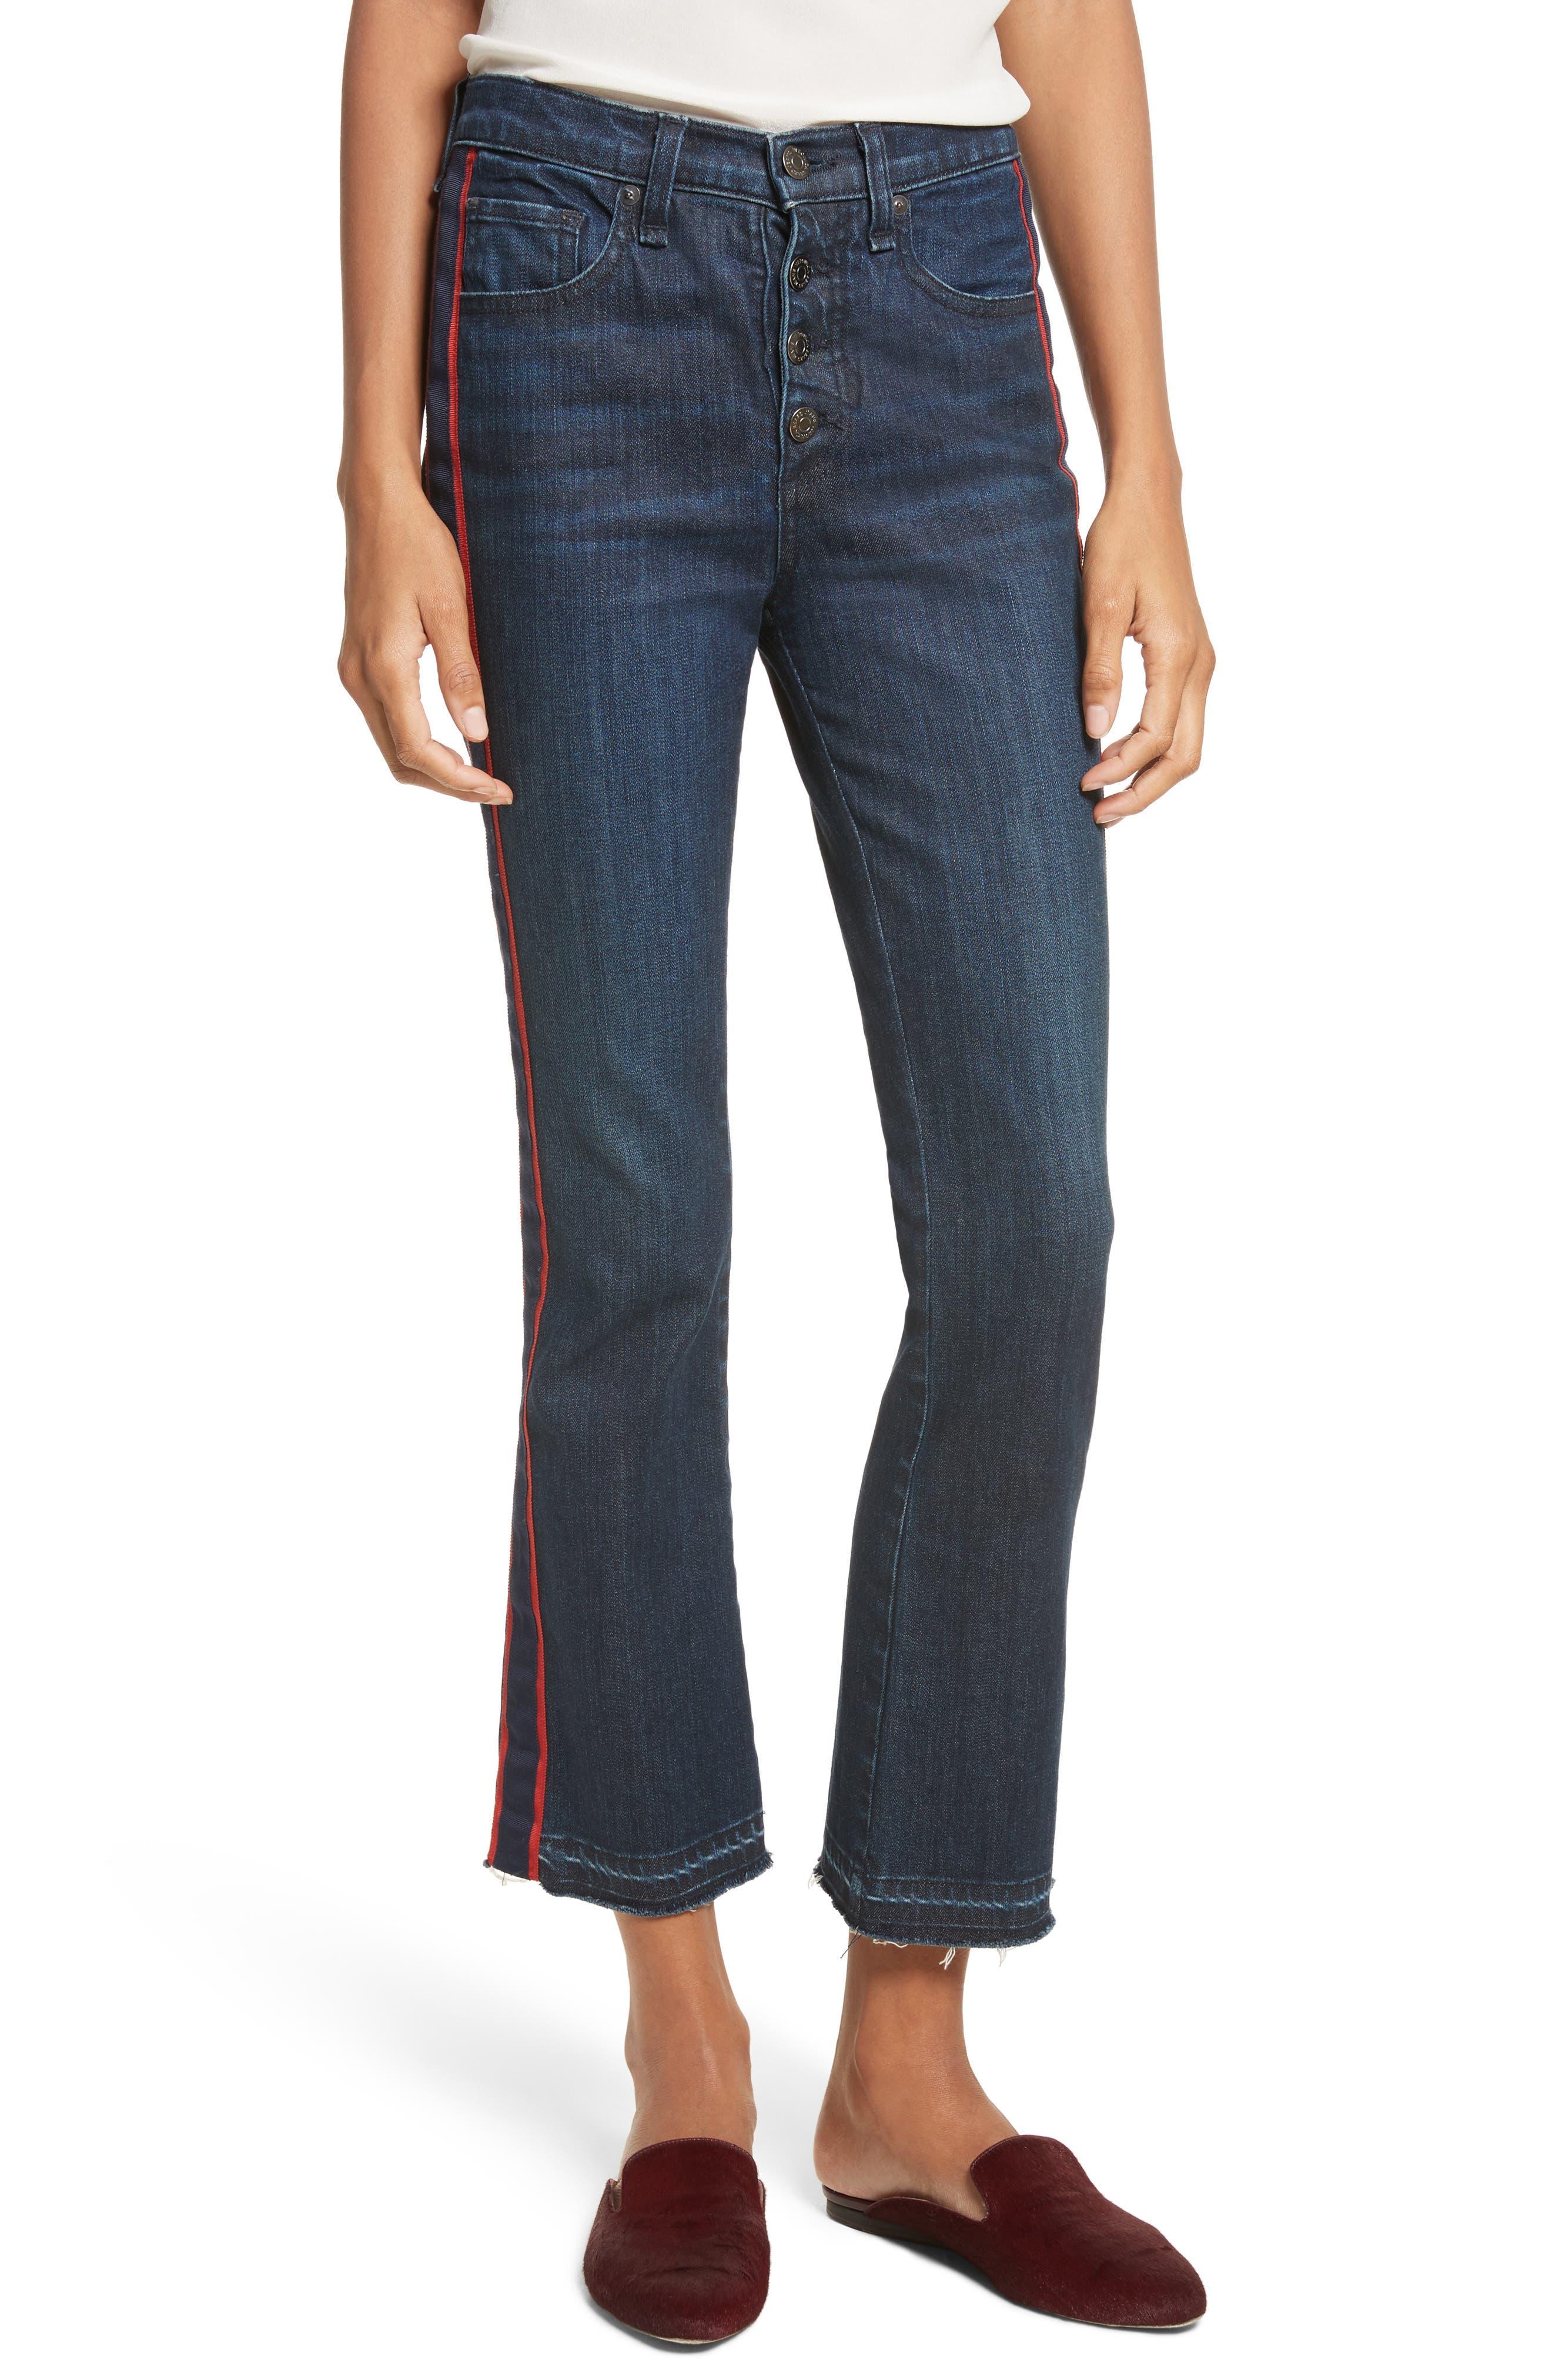 Alternate Image 1 Selected - Veronica Beard Carolyn Tuxedo Stripe Baby Boot Crop Jeans